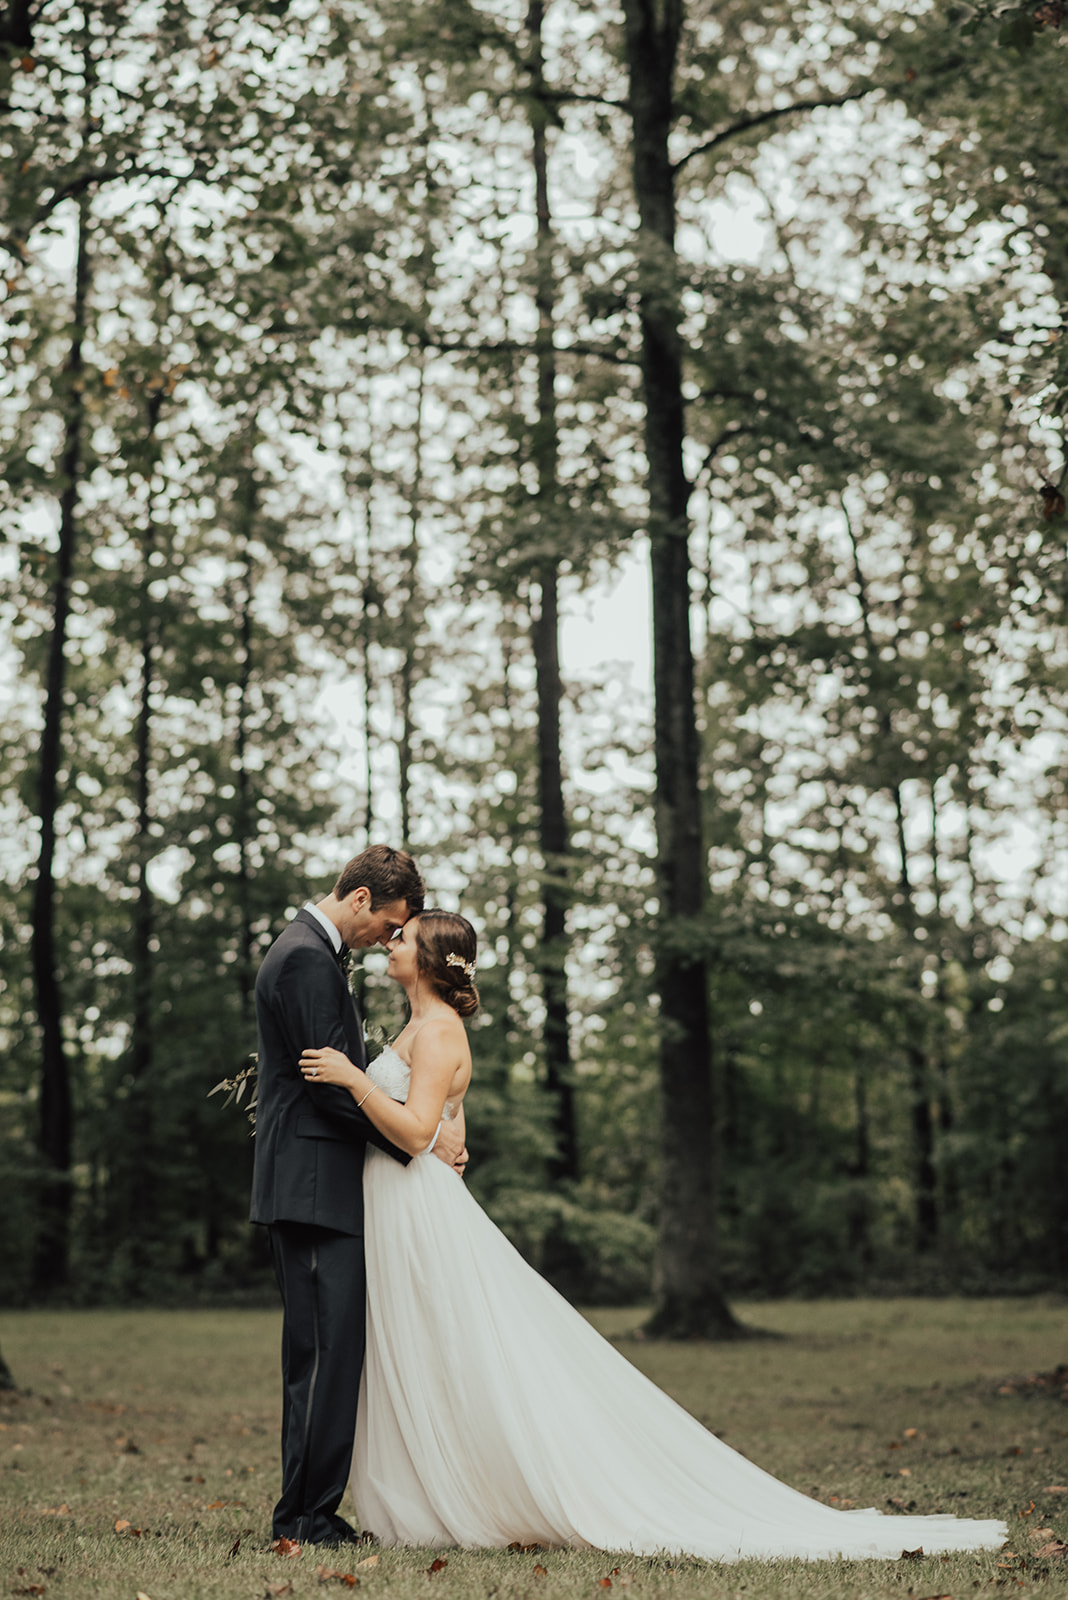 Richmond VA Wedding By SB Photographs253253.jpg